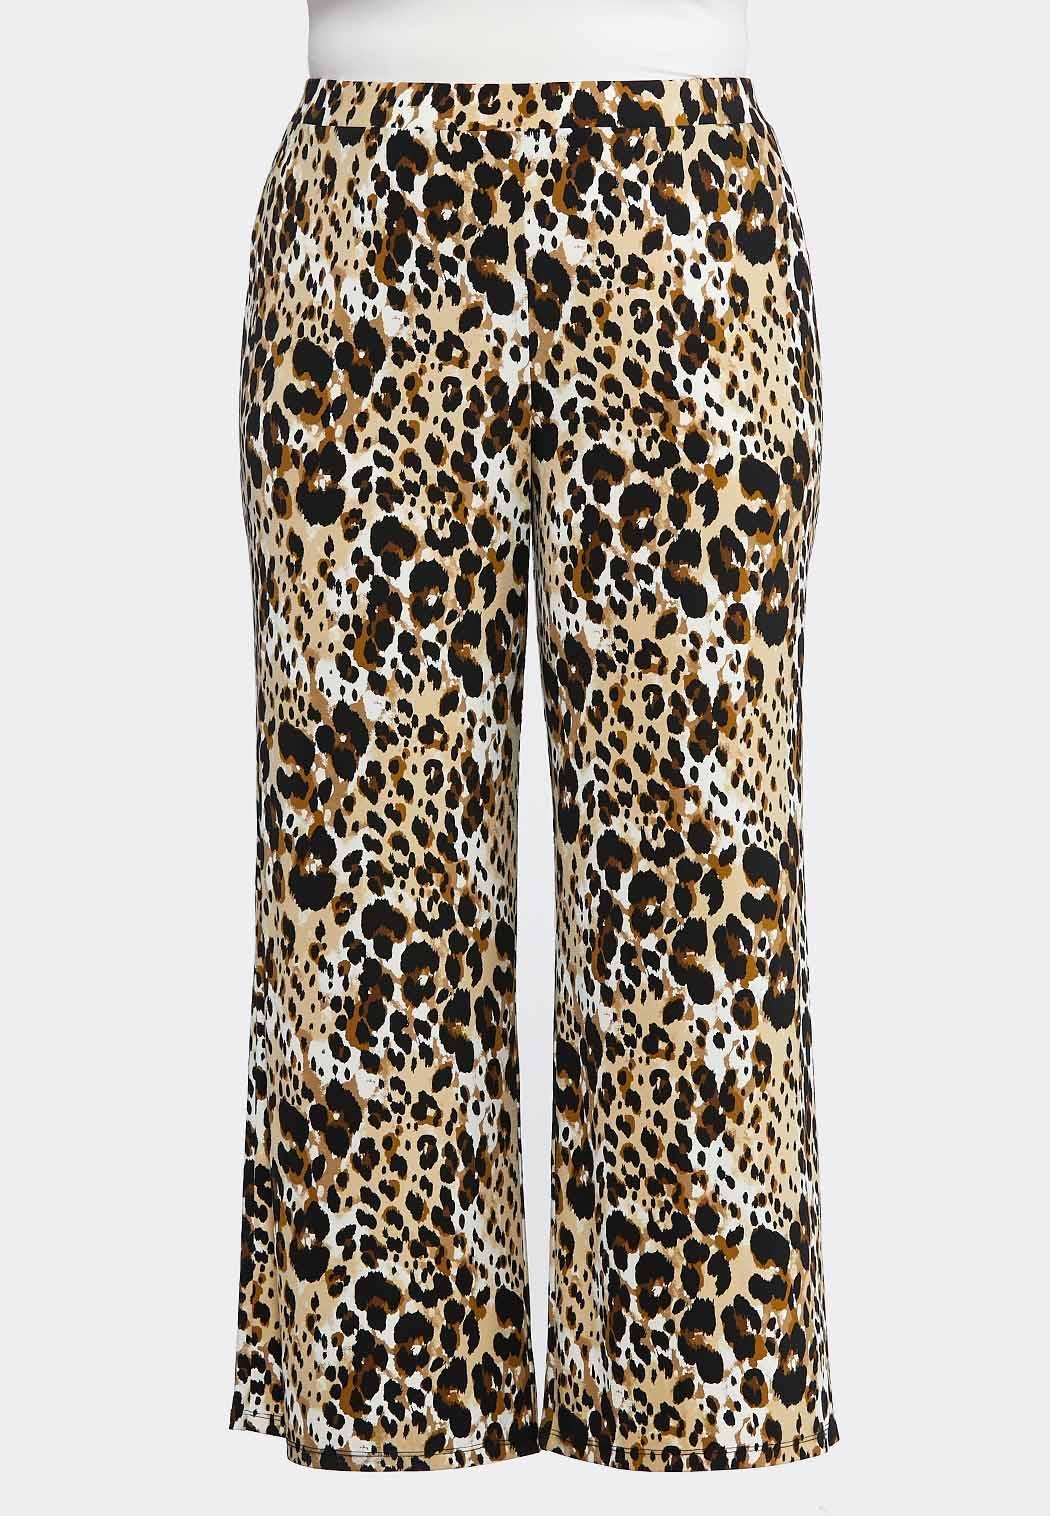 99001e3a03db99 Plus Size Breezy Leopard Palazzo Pants Pants Cato Fashions